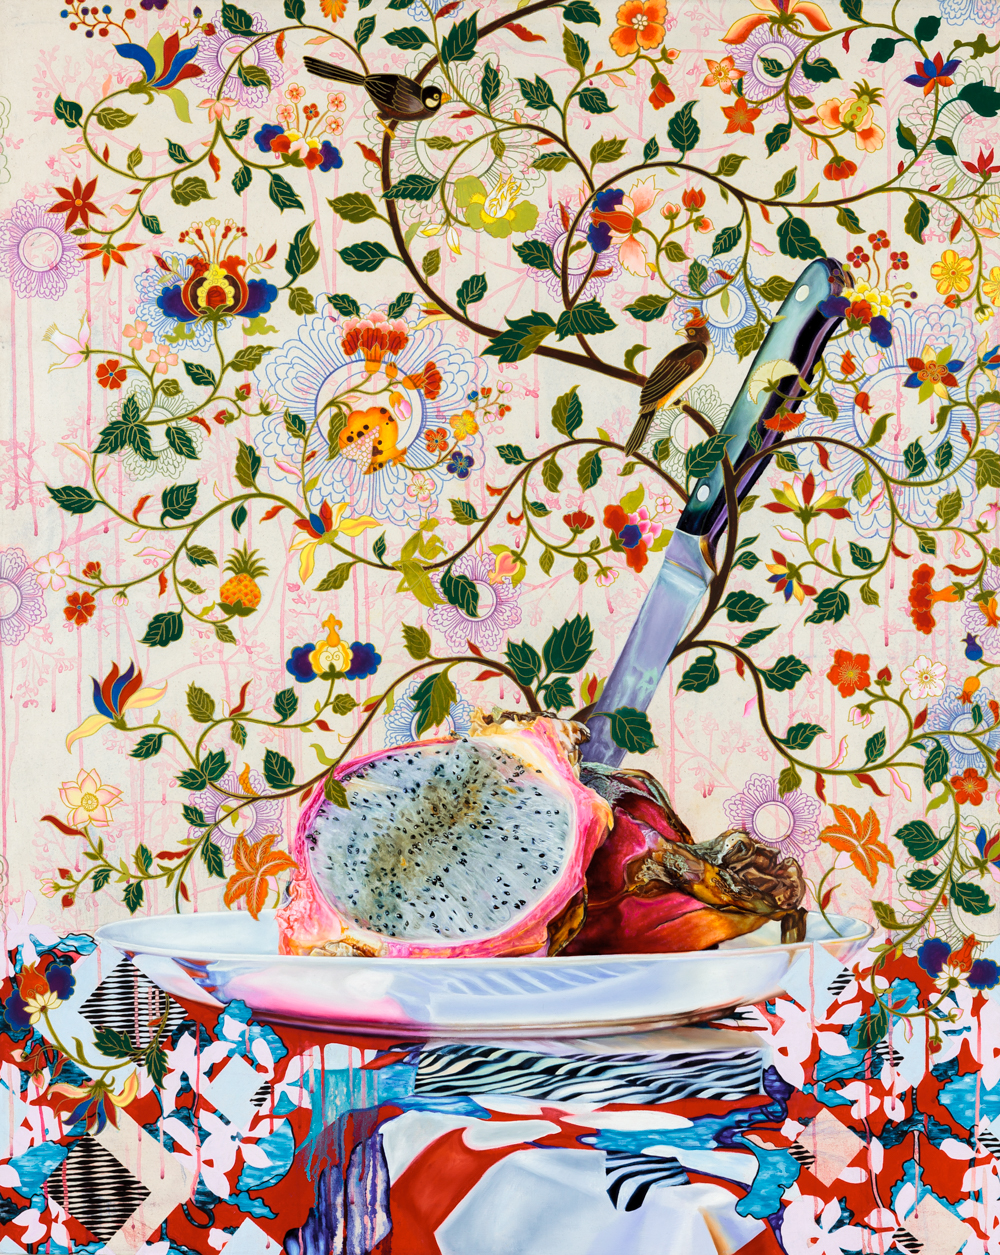 "Miss Havisham Invites You to Tea   Oil, flashe, acrylic ink & pigment pen on canvas  50"" x 40""  2015"